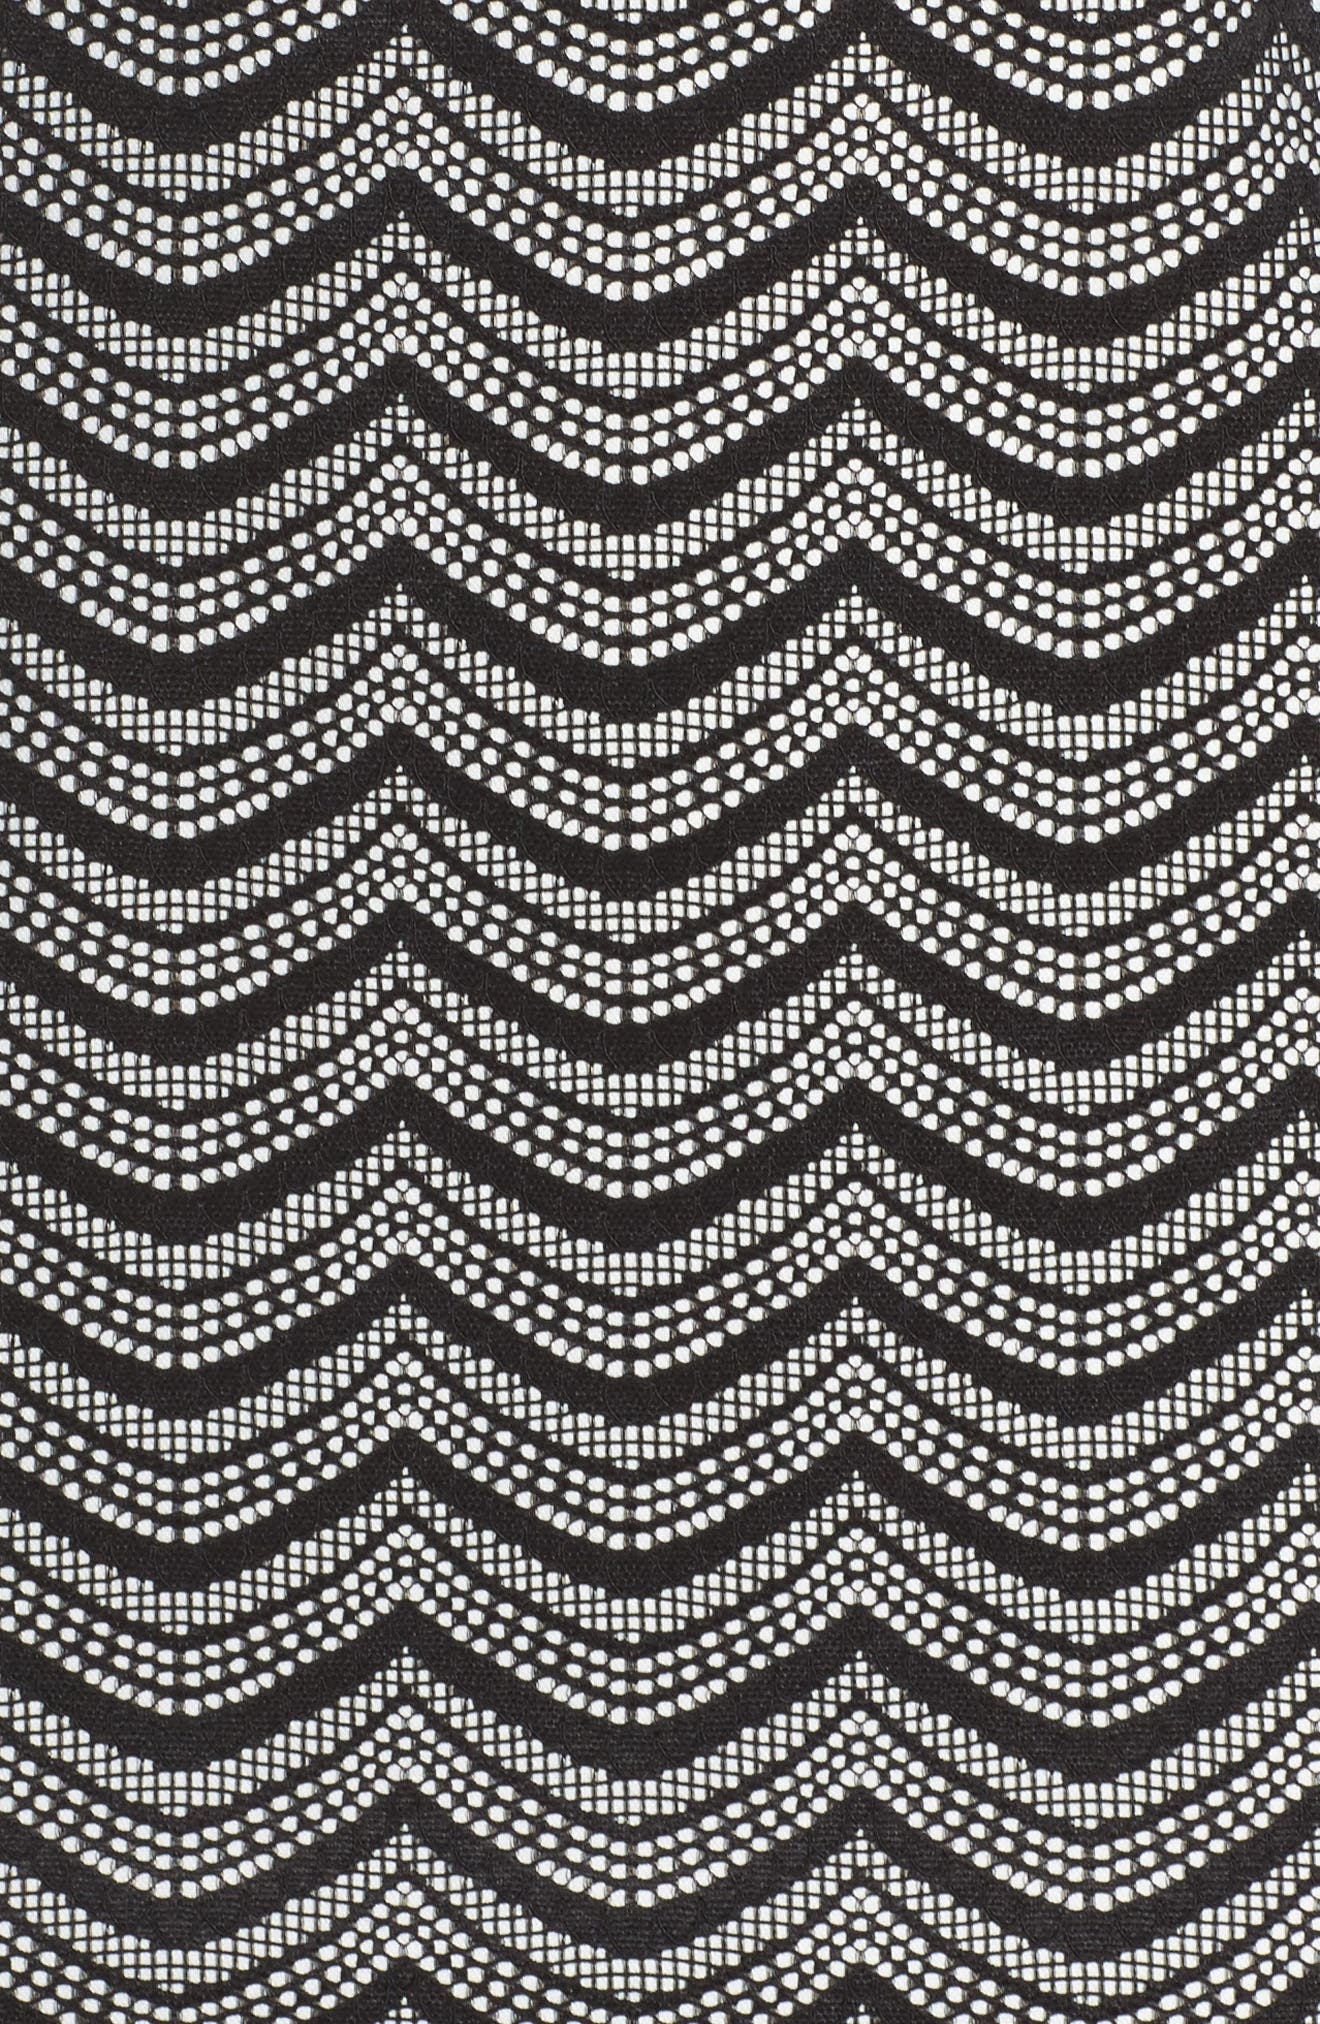 Fringe Sheath Dress,                             Alternate thumbnail 5, color,                             001